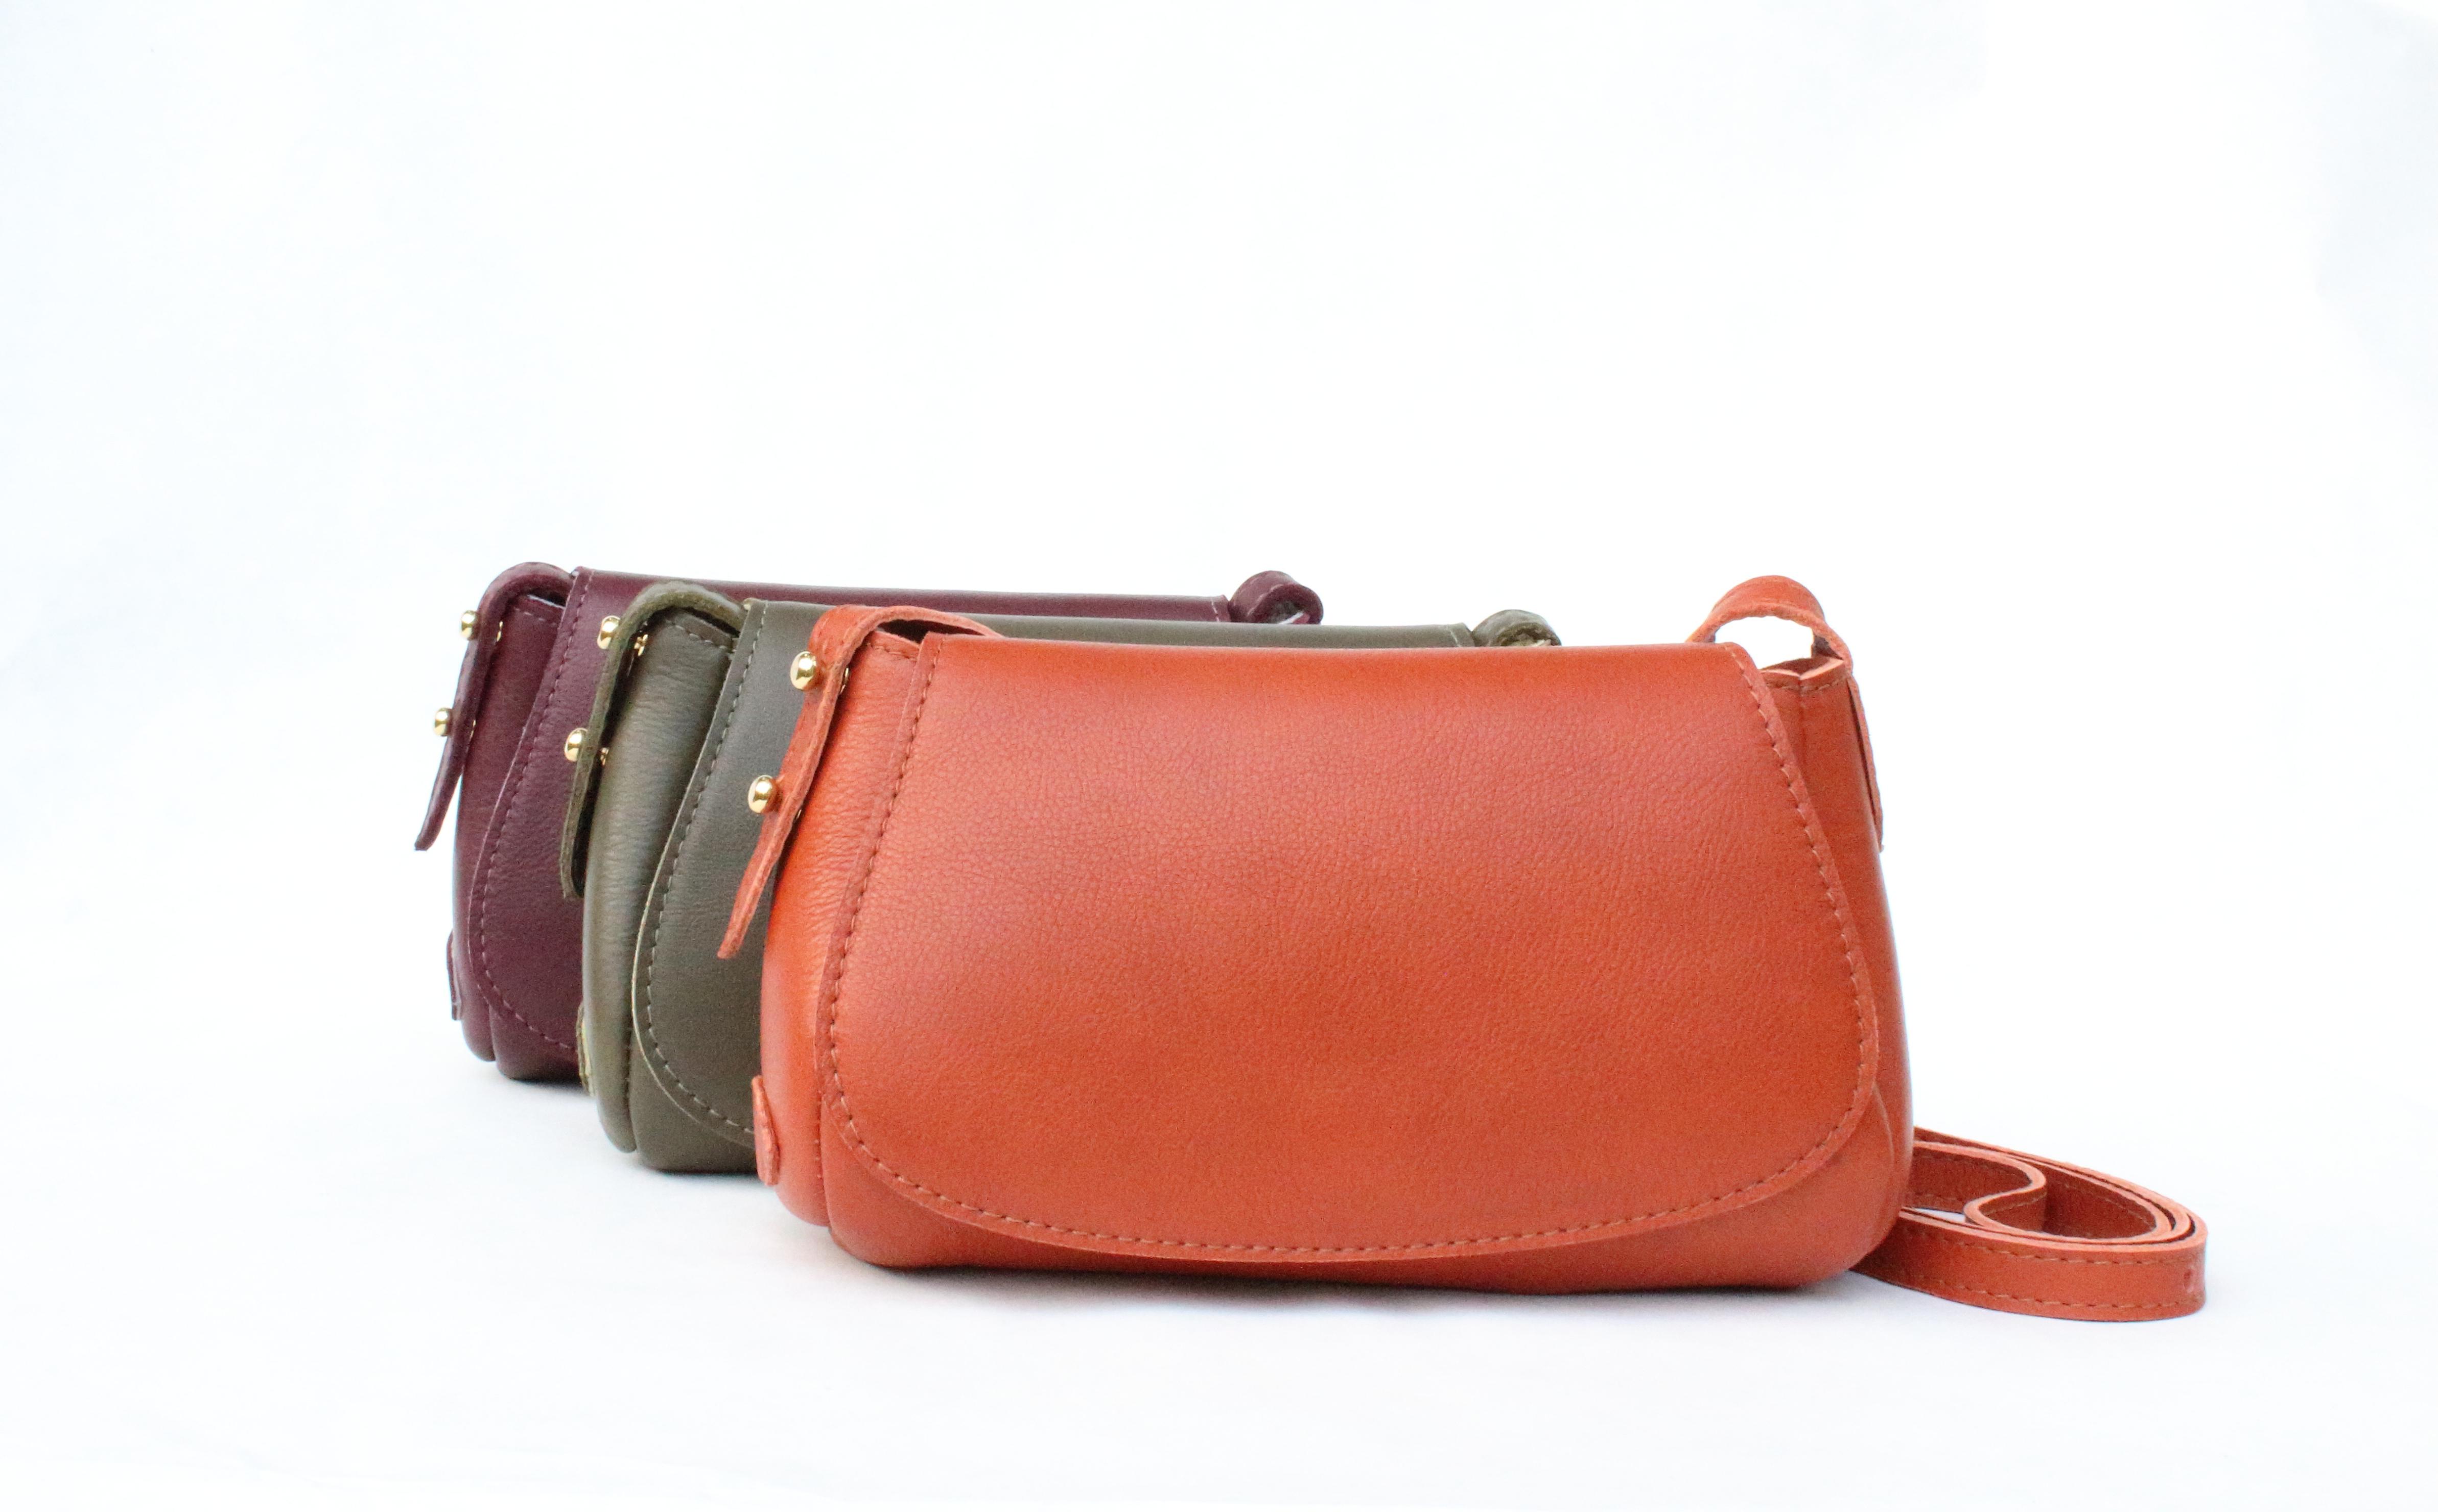 Leather/Suede Crossbody Saddle Bag